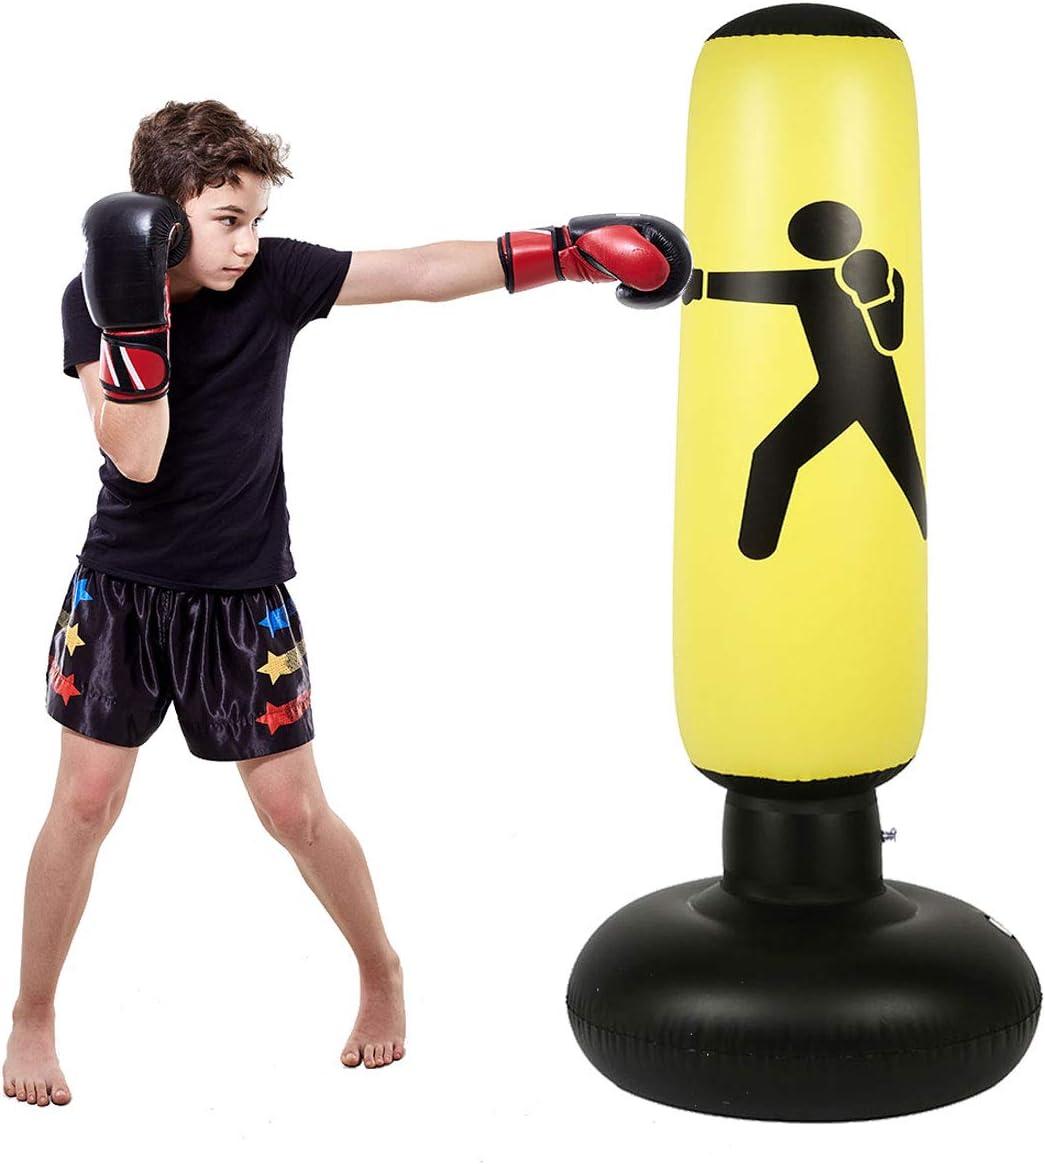 C CRYSTAL LEMON Fitness Punching Bag for Kids, Heavy Punching Bag Inflatable Punching Tower Bag Freestanding Children Fitness Play Adults De-Stress Boxing Target Bag Over 5ft